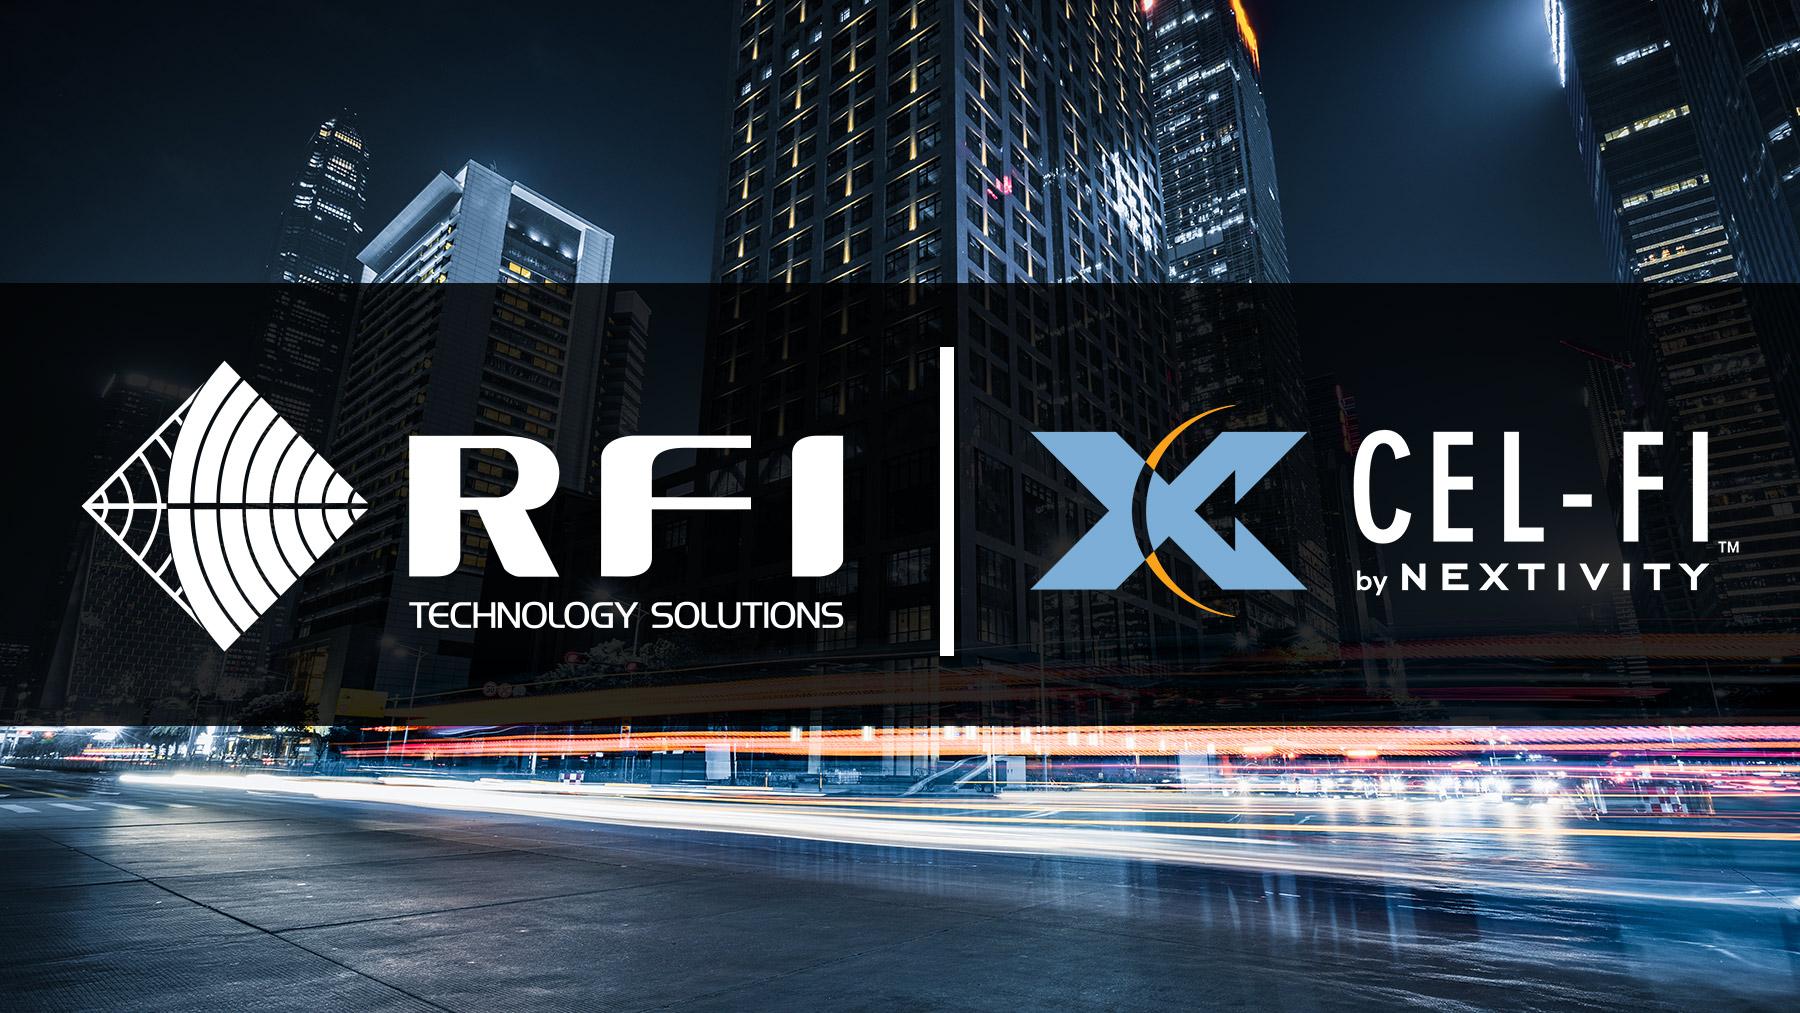 Nextivity officially launches next Gen CEL-FI GO G41 and QUATRA 4000e at Mobile World Congress